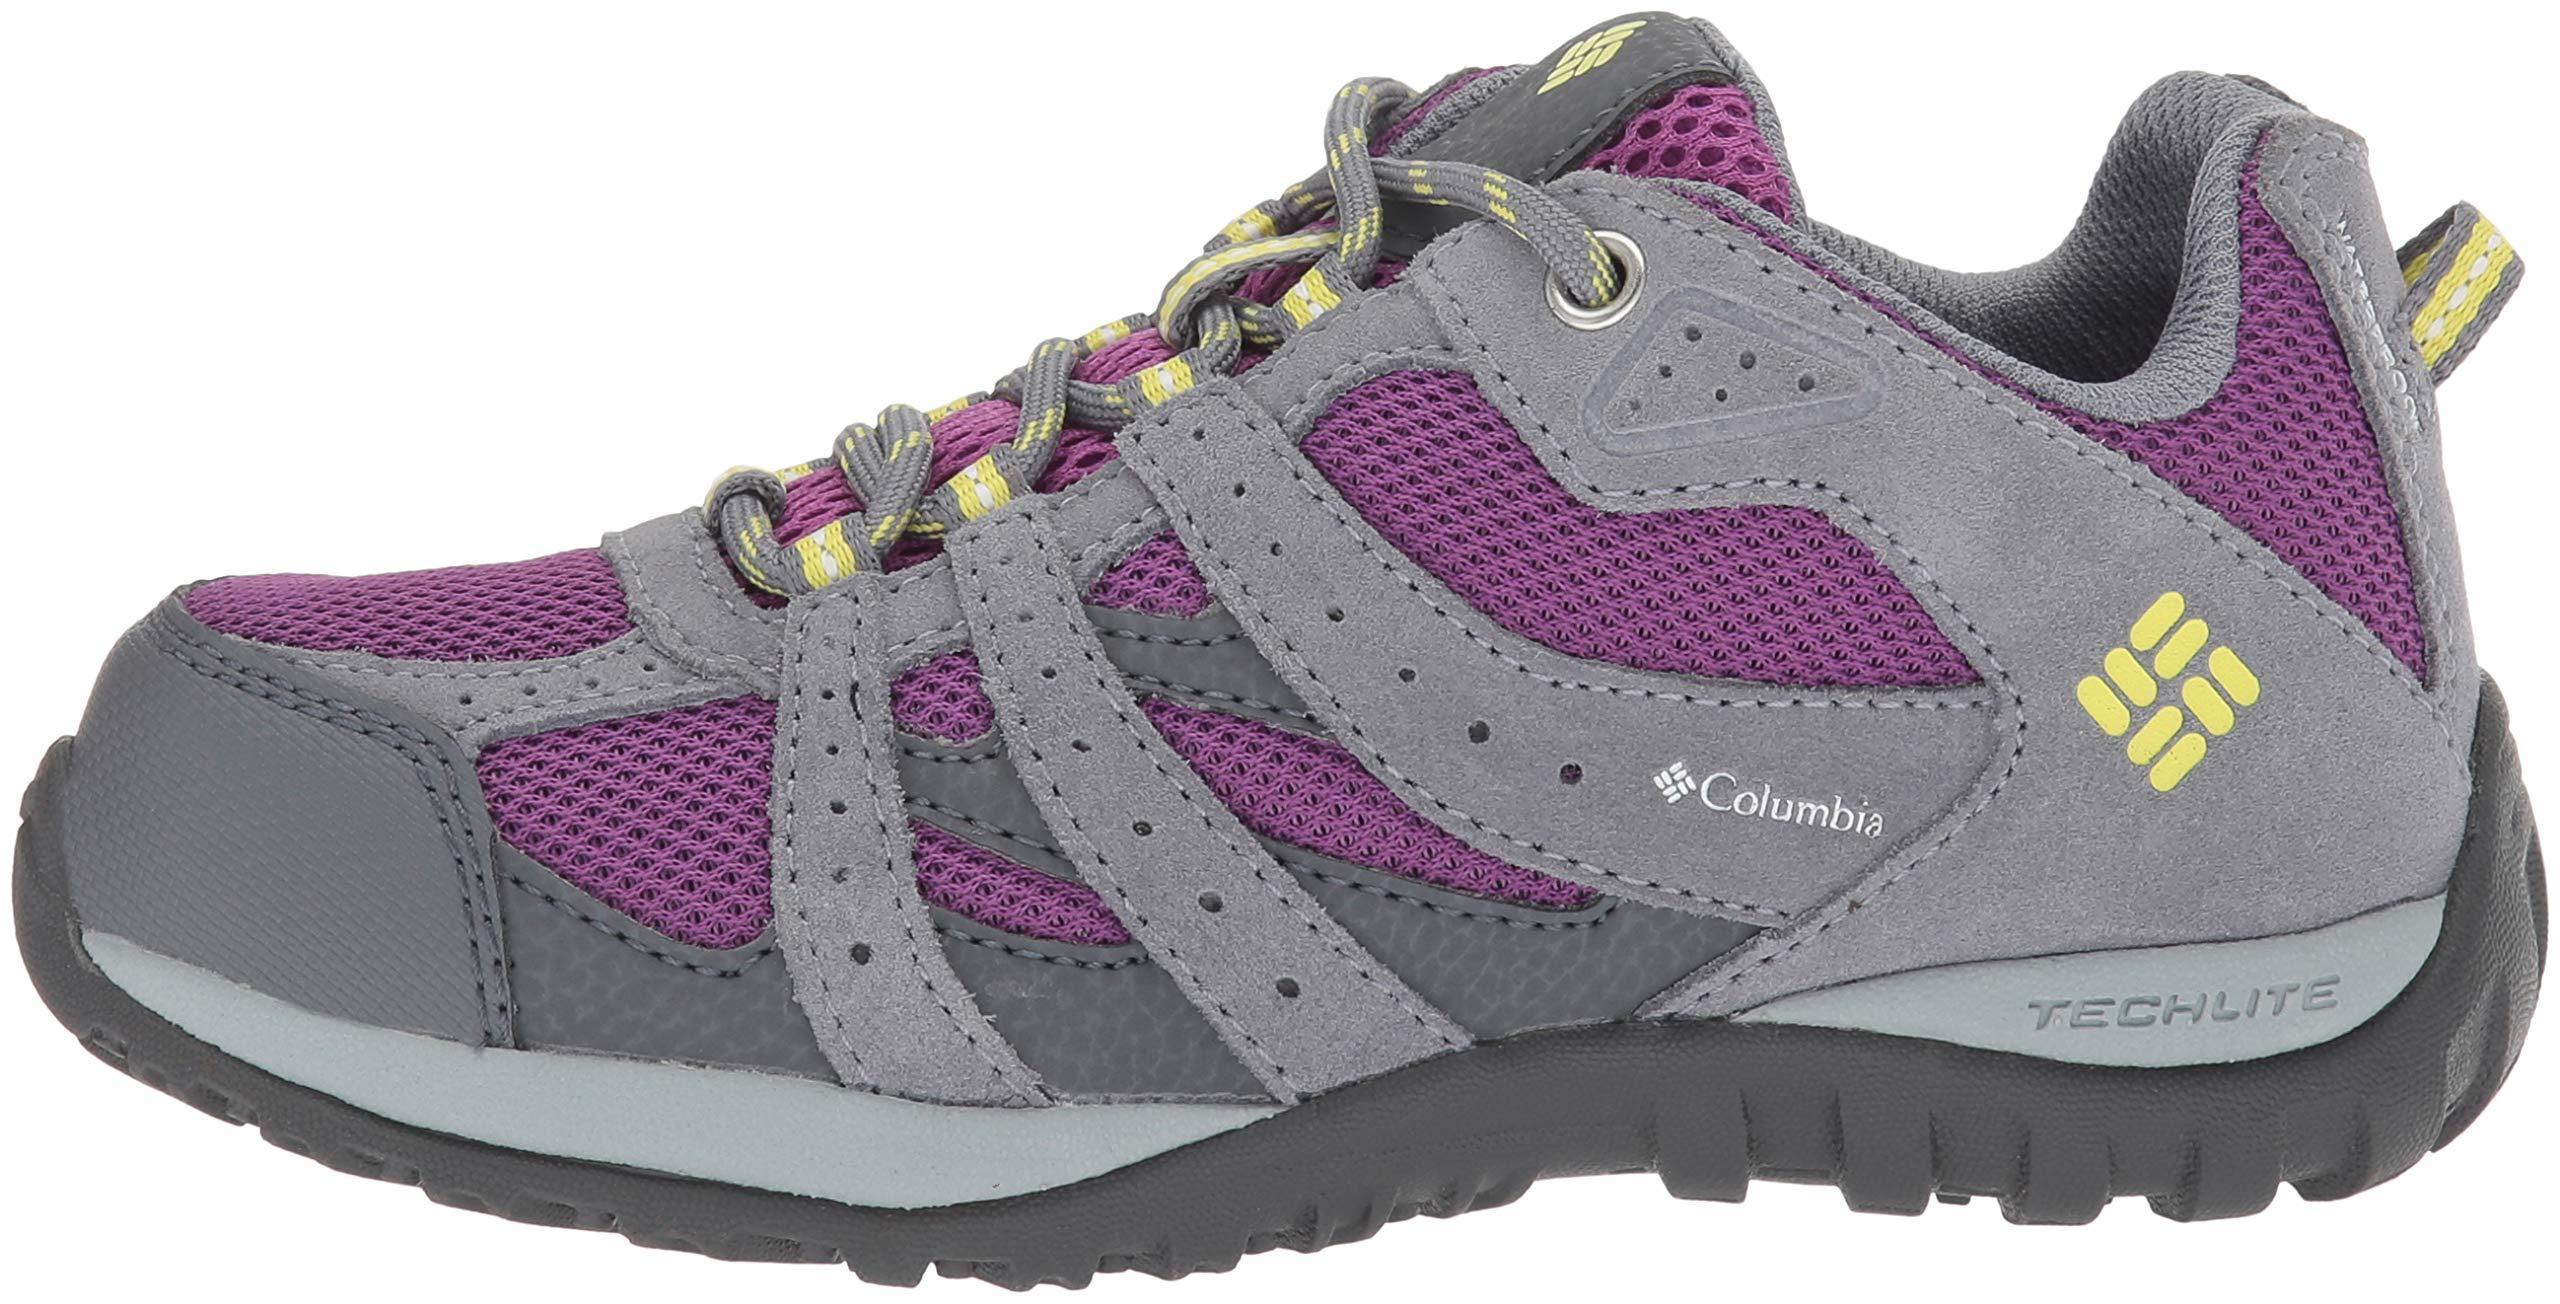 Columbia Girls' Youth Redmond Waterproof Hiking Shoe, Plum, Fresh Kiwi, 4 Regular US Big Kid by Columbia (Image #5)